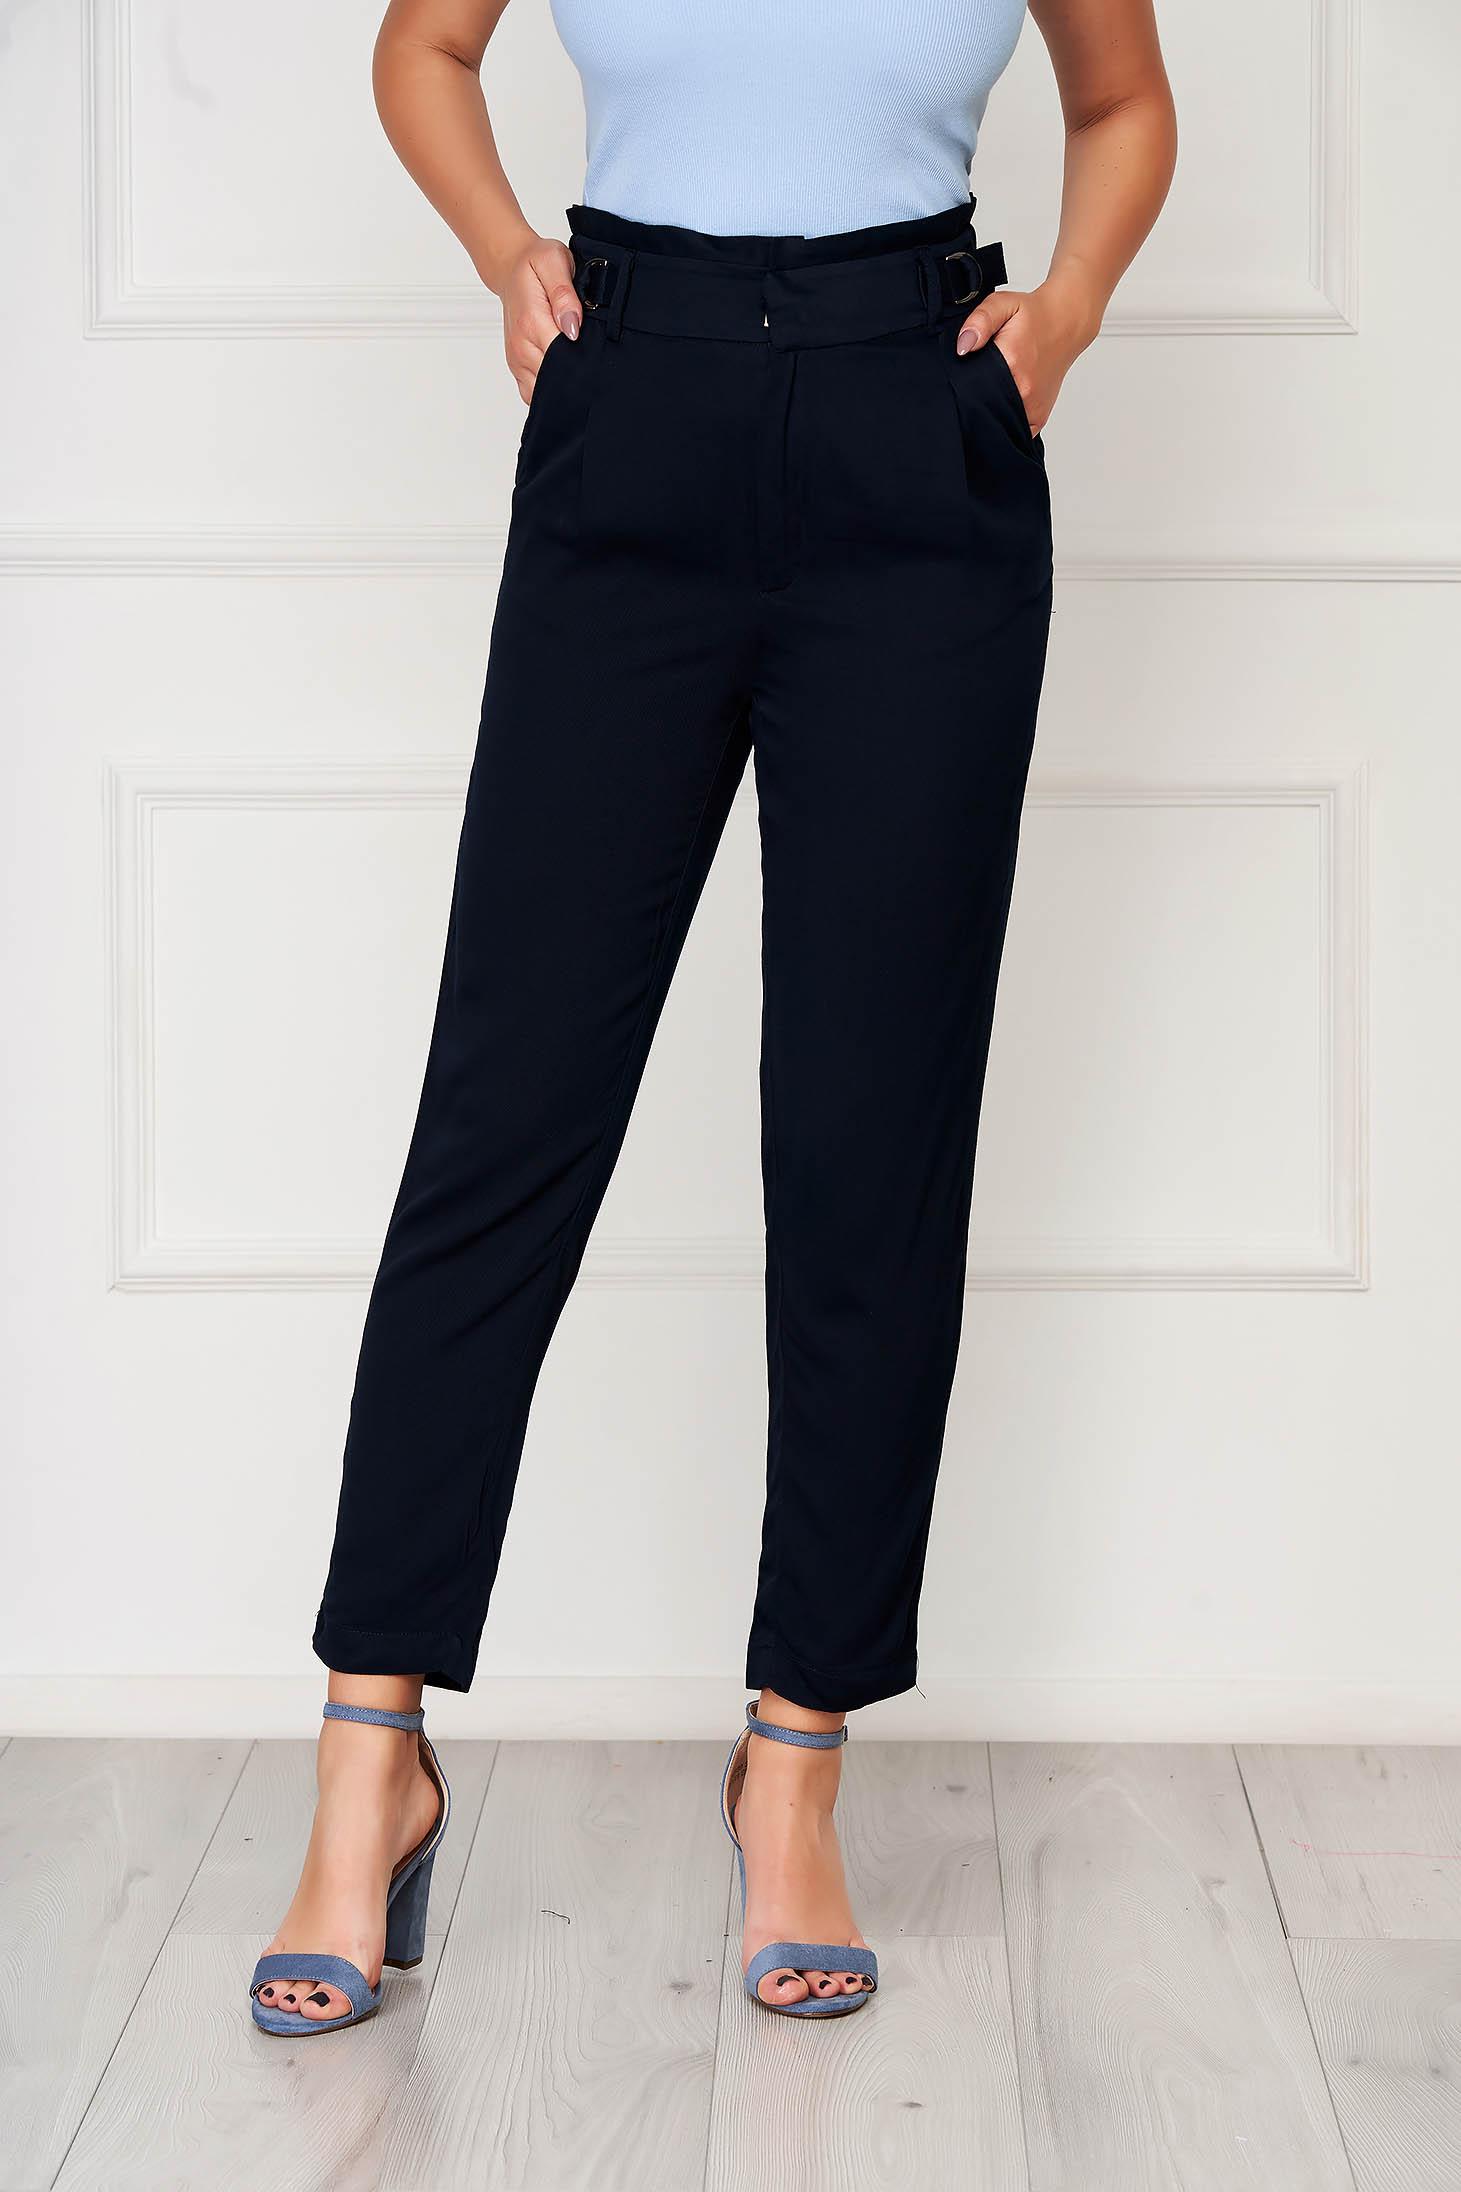 Pantaloni Top Secret albastru-inchis office cu talie inalta cu elastic in talie din material fin la atingere